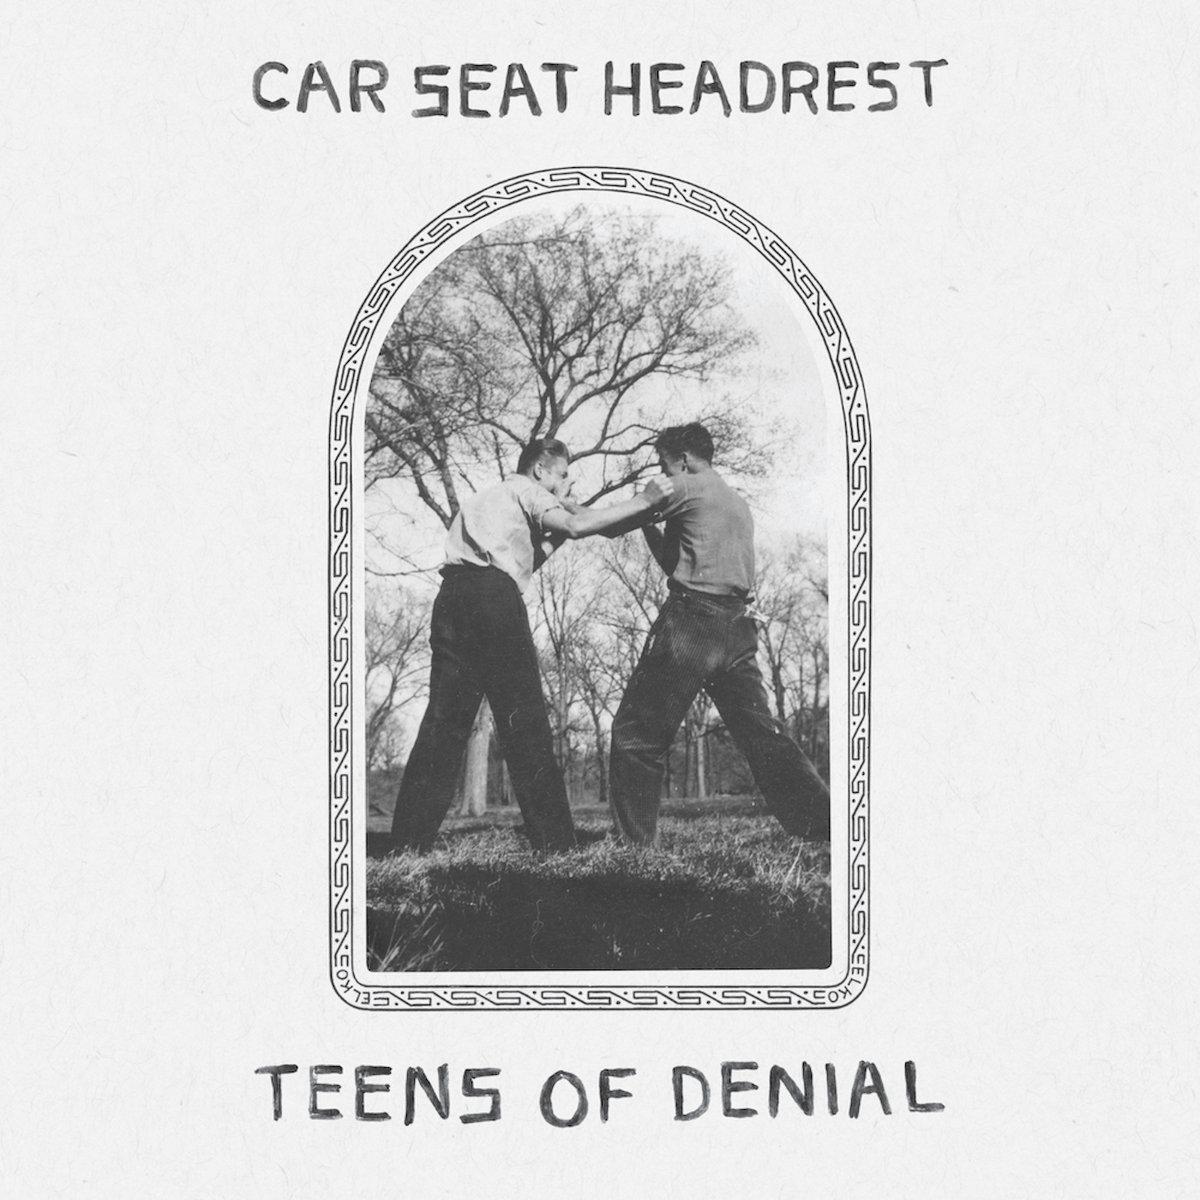 By Car Seat Headrest